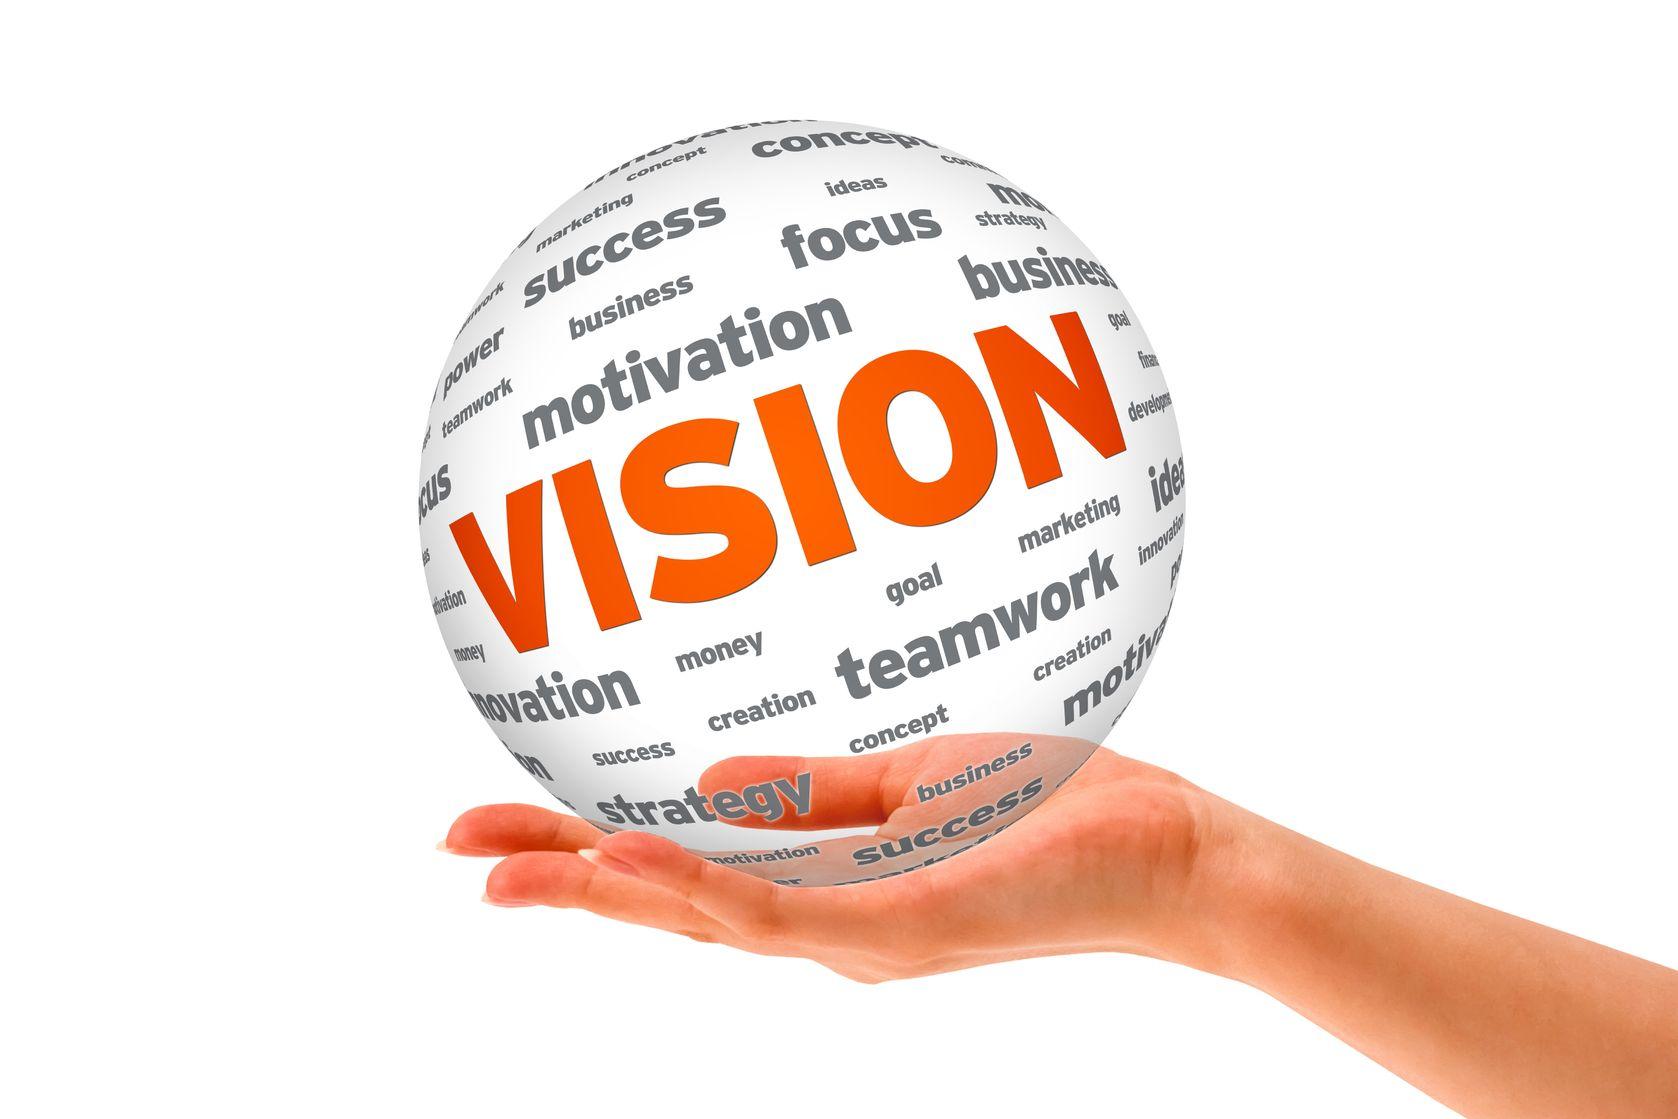 vision-image11.jpg